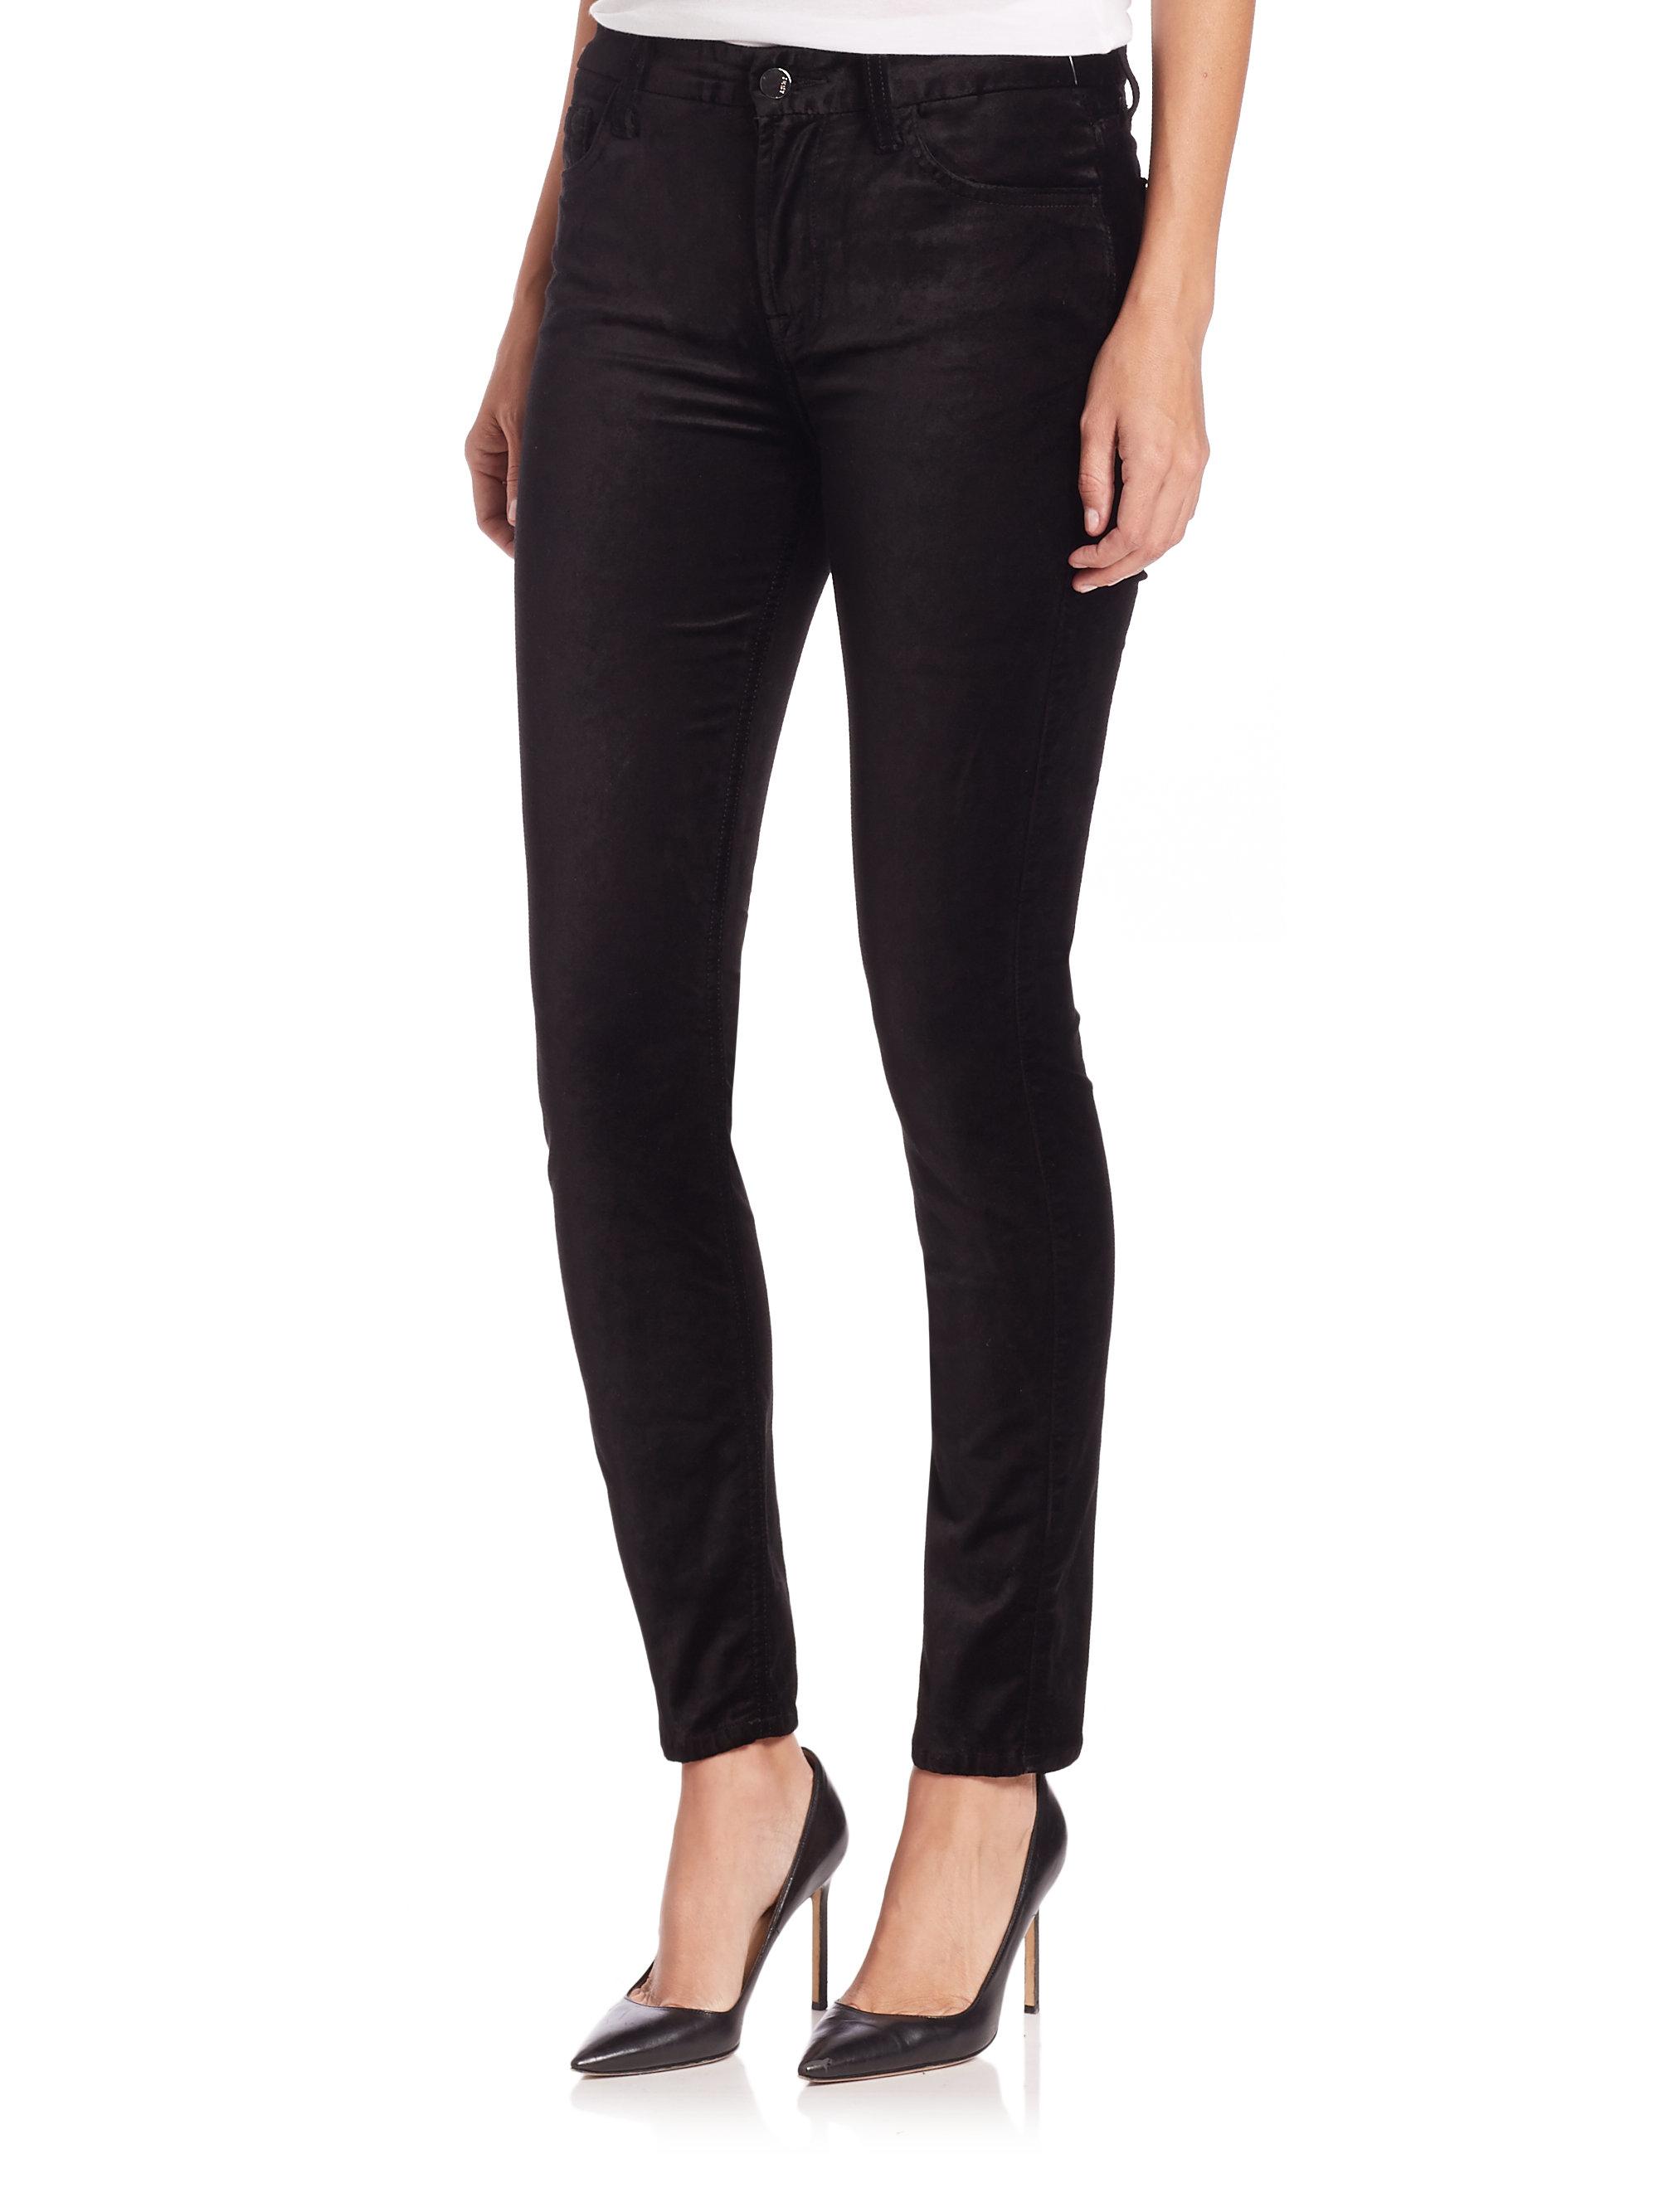 Jen7 Velvet Skinny Jeans In Black   Lyst